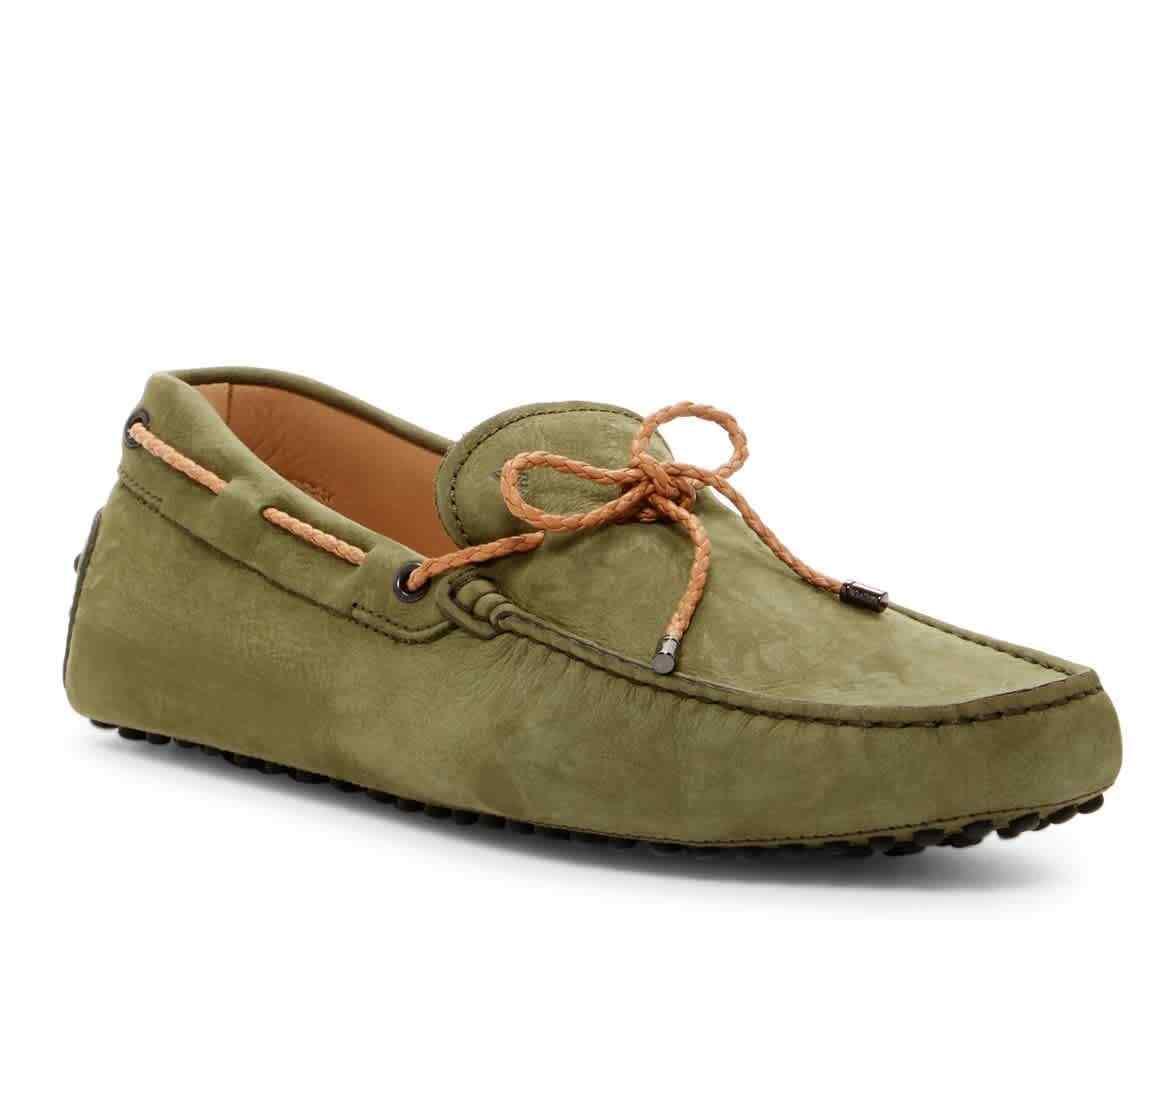 Tods Para hombre verde Gommino Conducción Zapatos